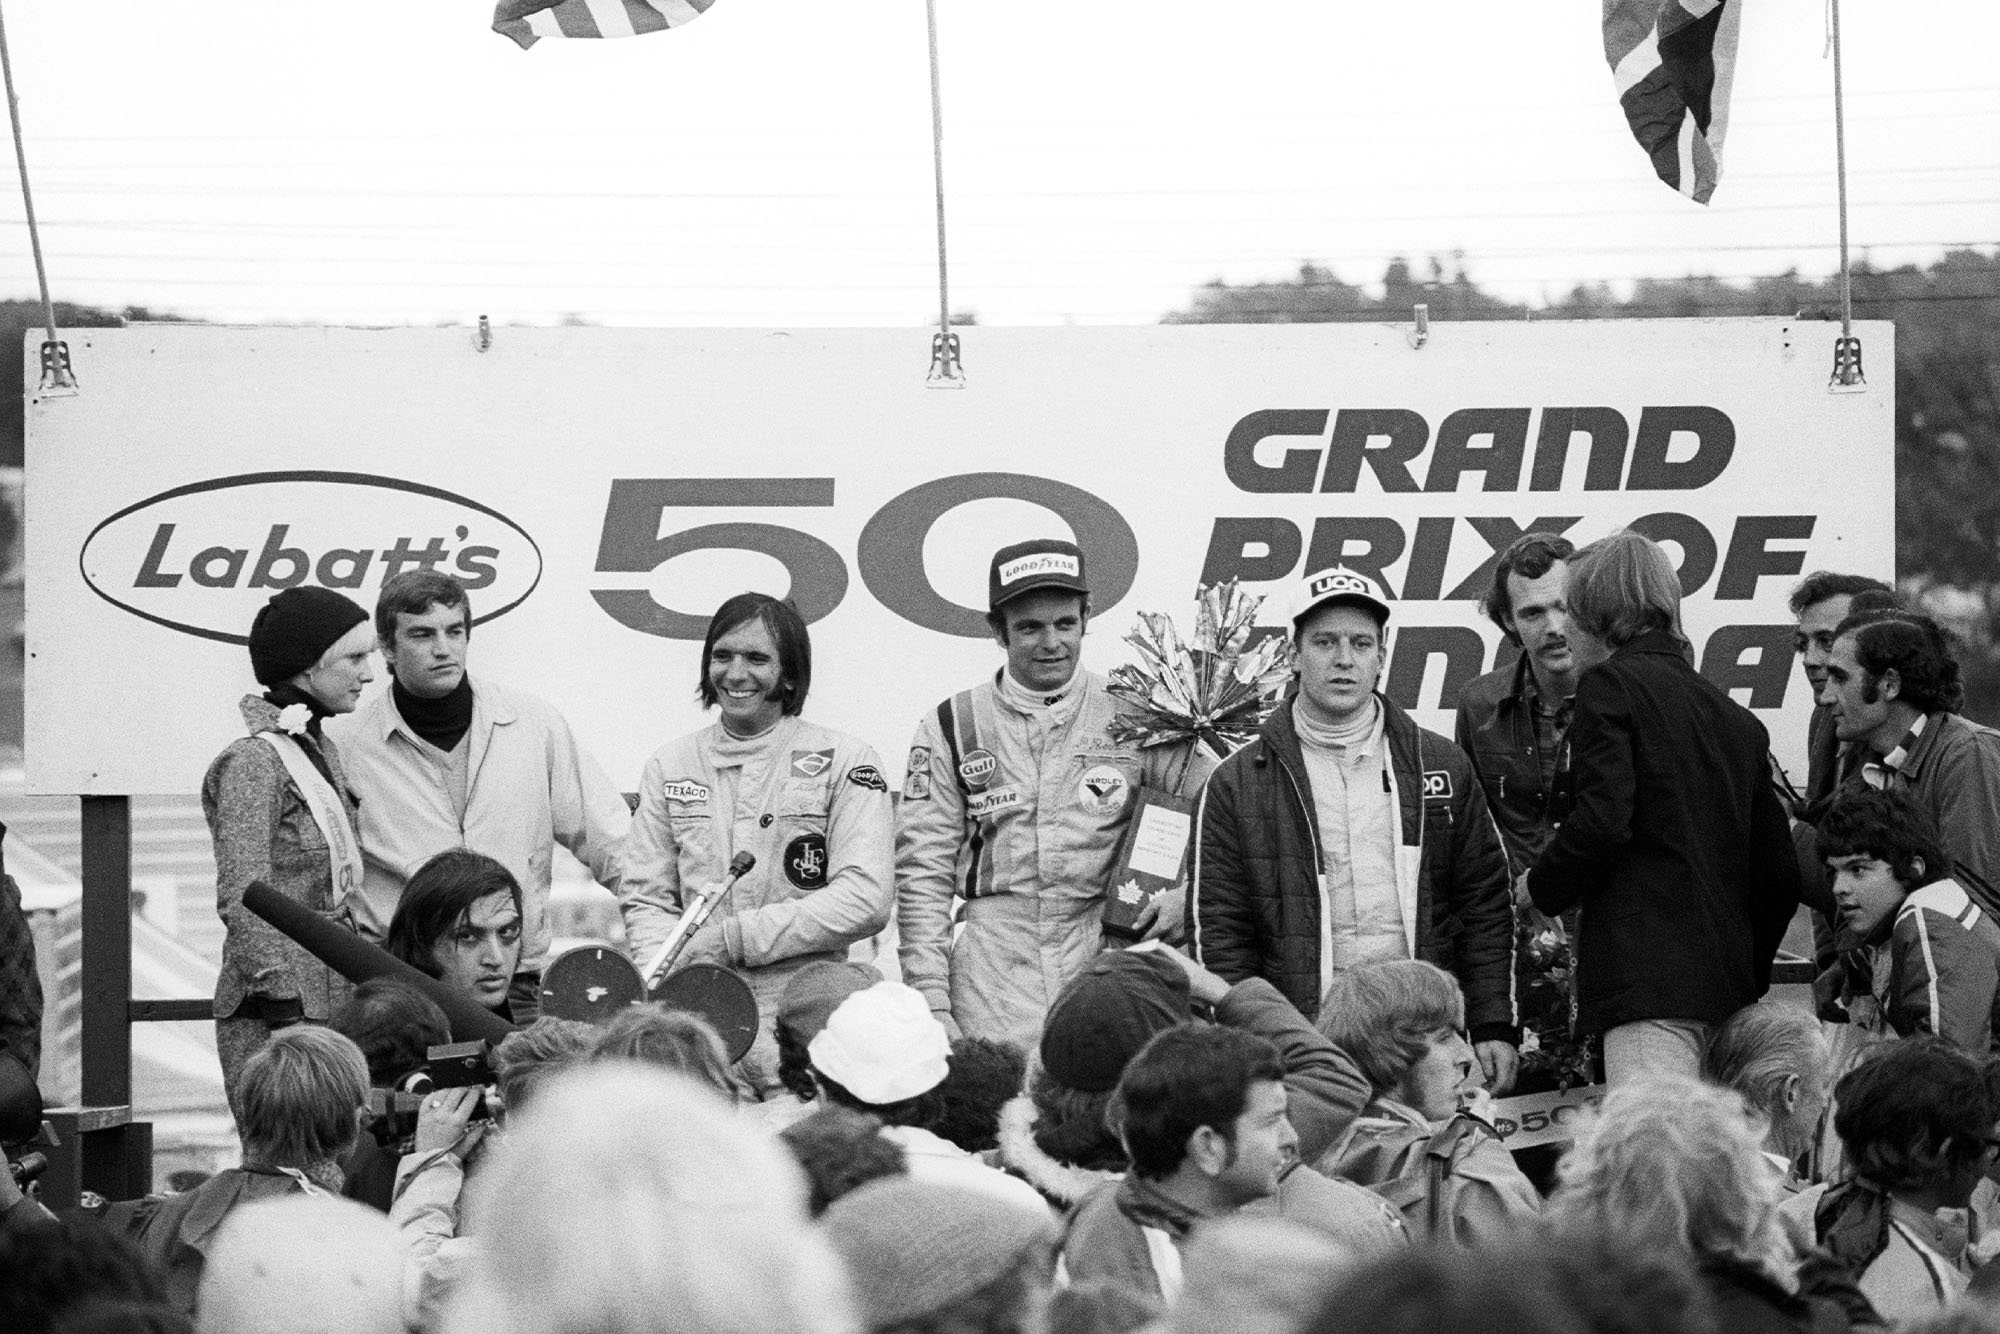 Peter Revson (McLaren) celebrates on the podium afer winning the 2973 Canadian Grand Prix, Mosport Park.